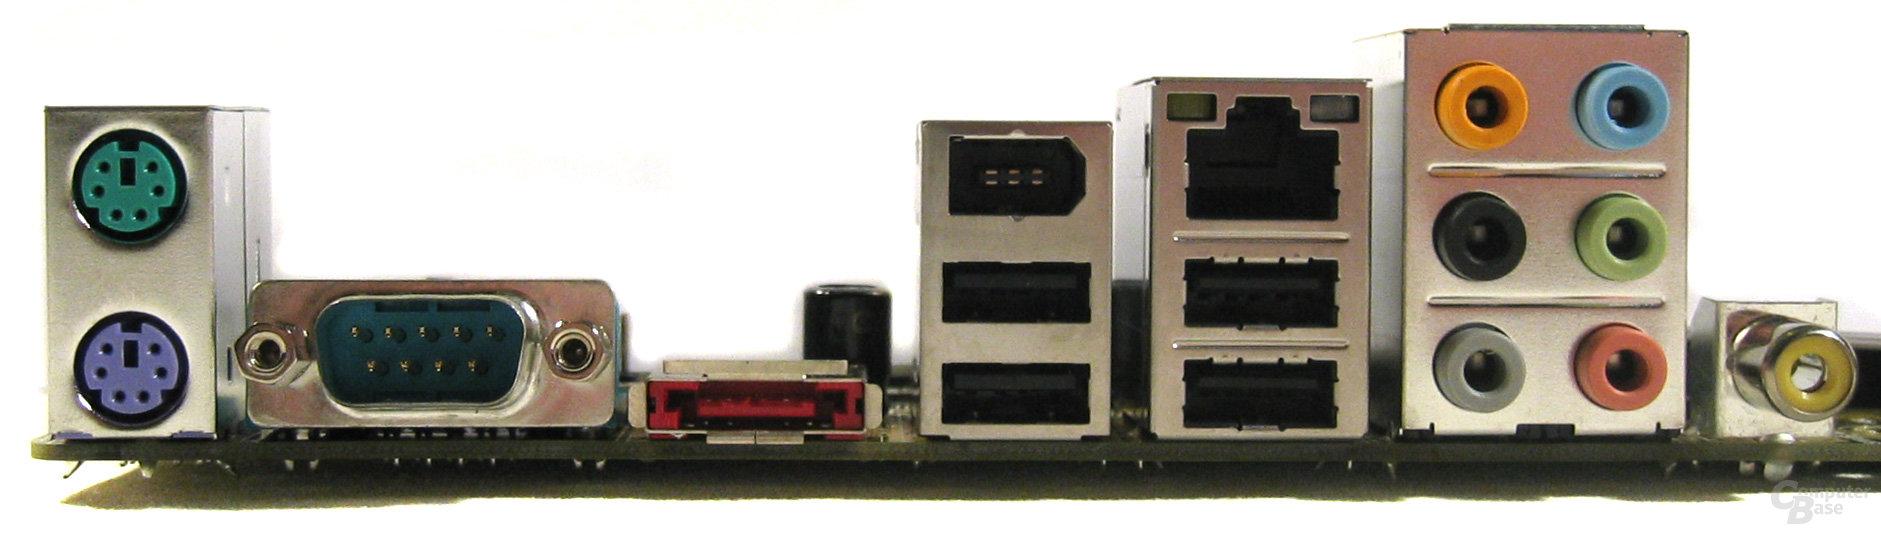 Asus M2R32-MVP ATX-Blende